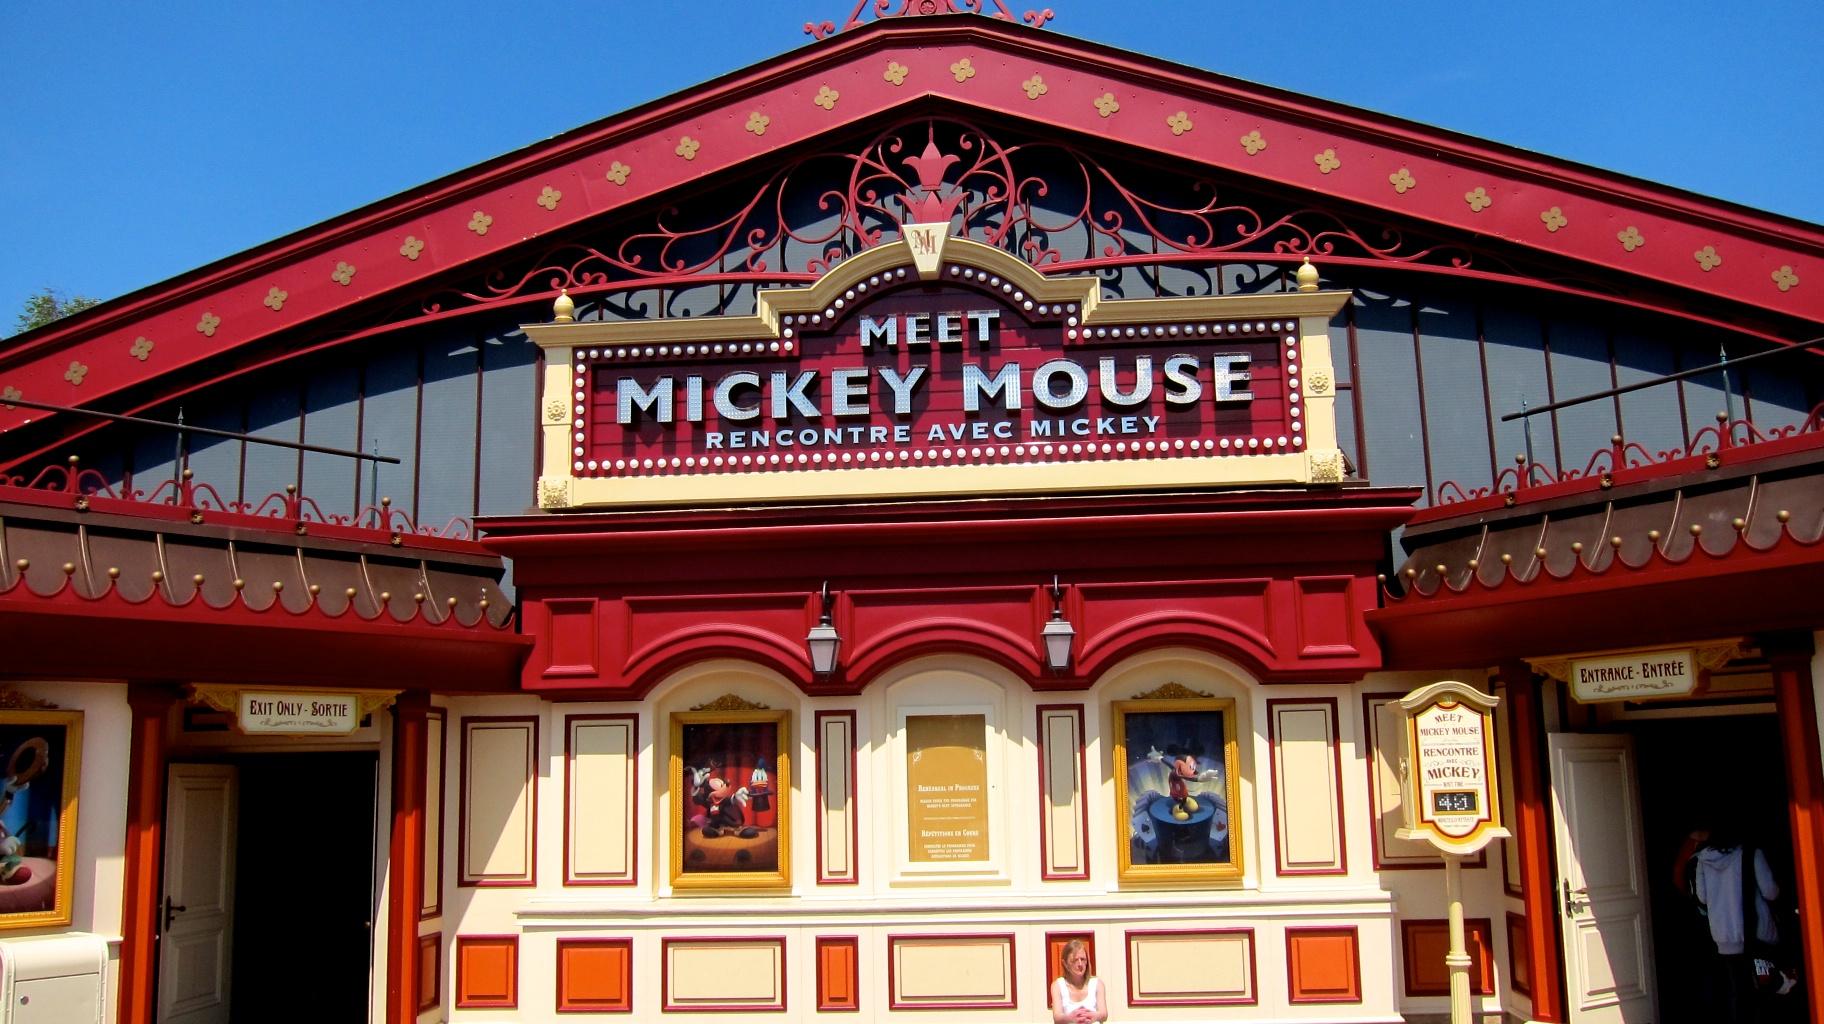 parisdisneyland-meet-mickey-mouse.jpg